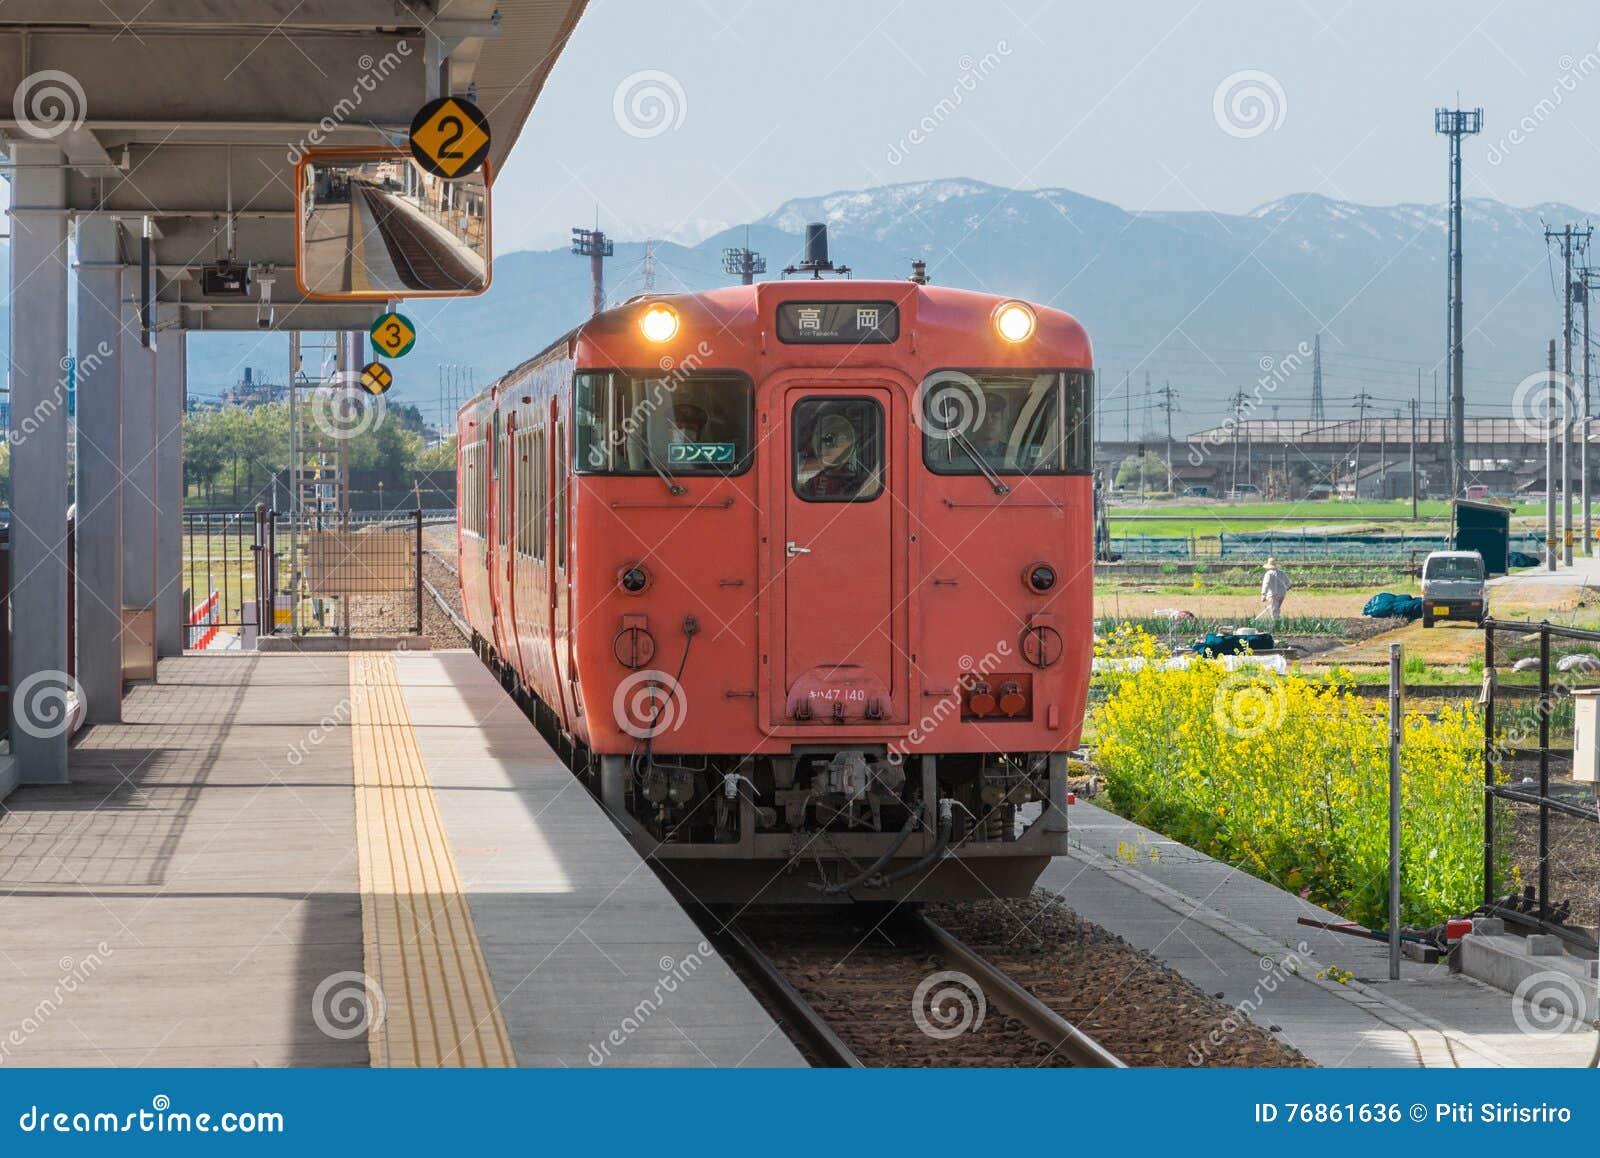 Le train local à la station de Takaoka TOYAMA, JAPON